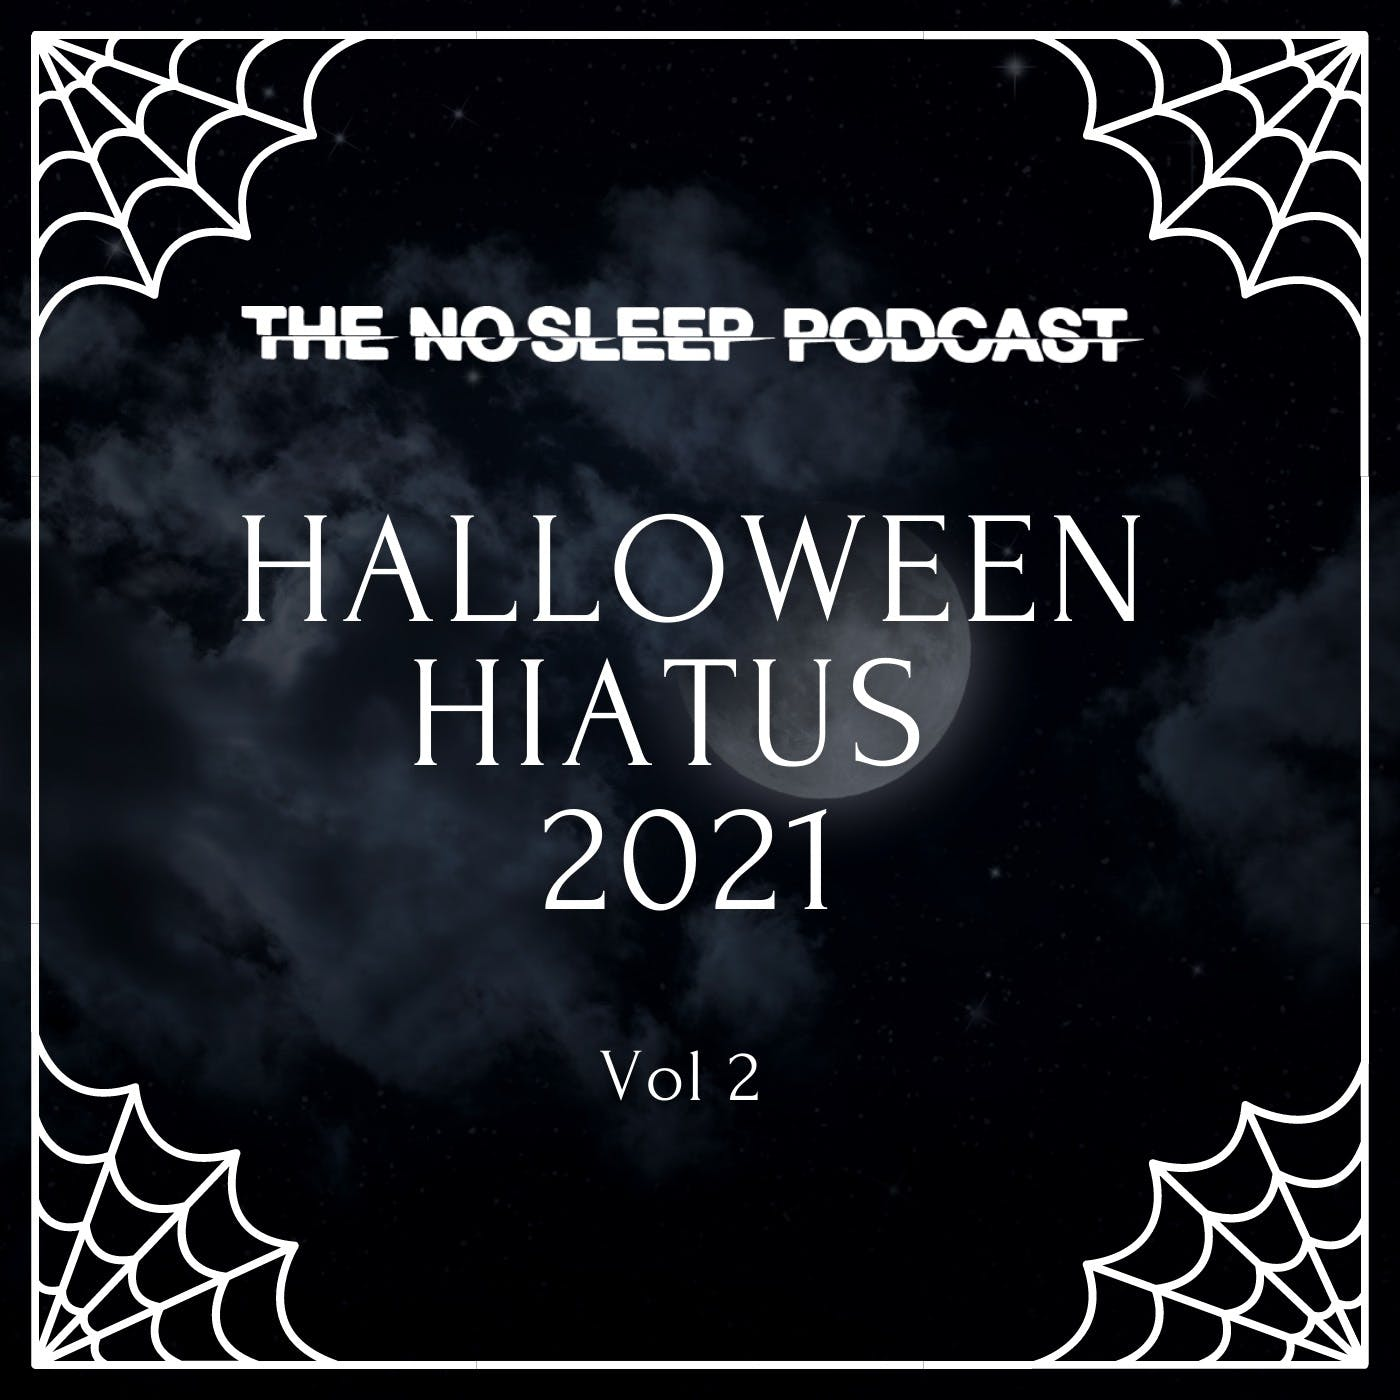 NoSleep Podcast S16 - Halloween Hiatus Vol. 2